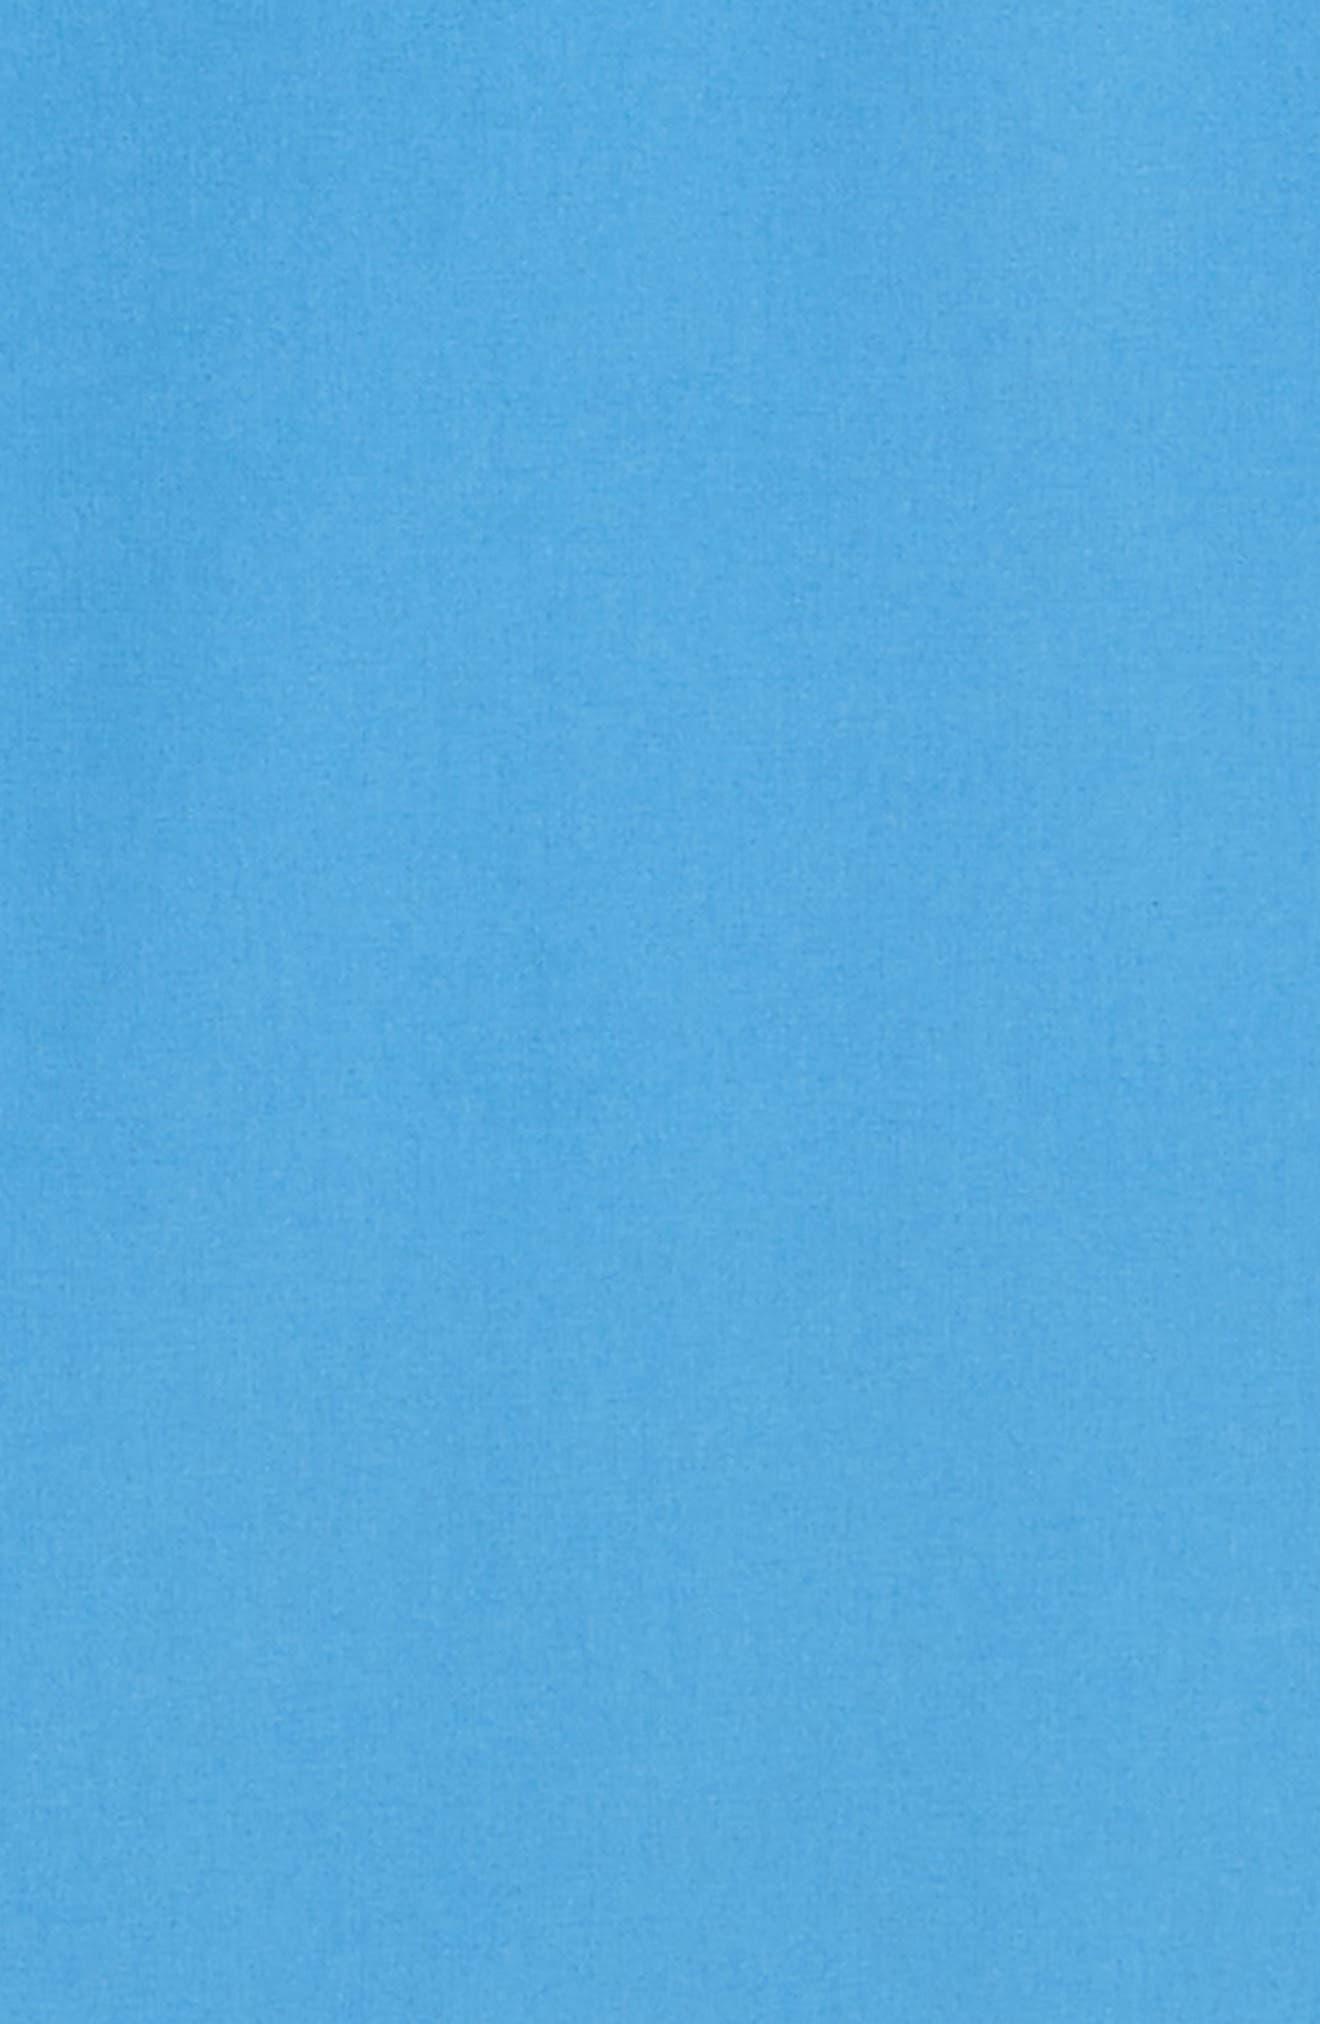 Performance Breaker Shorts,                             Alternate thumbnail 2, color,                             Hull Blue